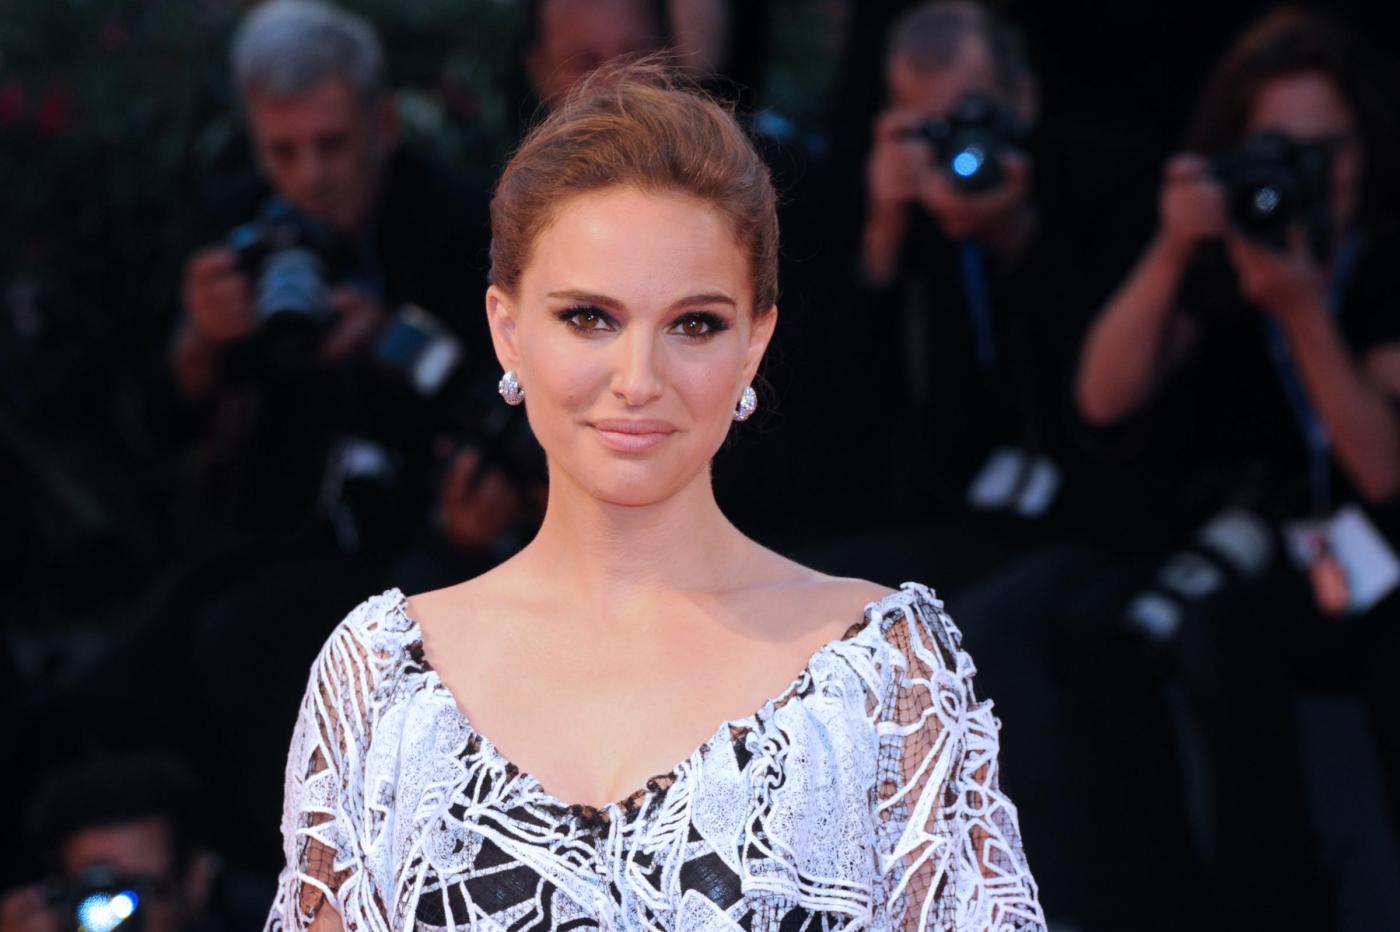 Natalie Portman a Venezia 2016 per il film su Jackie Kennedy